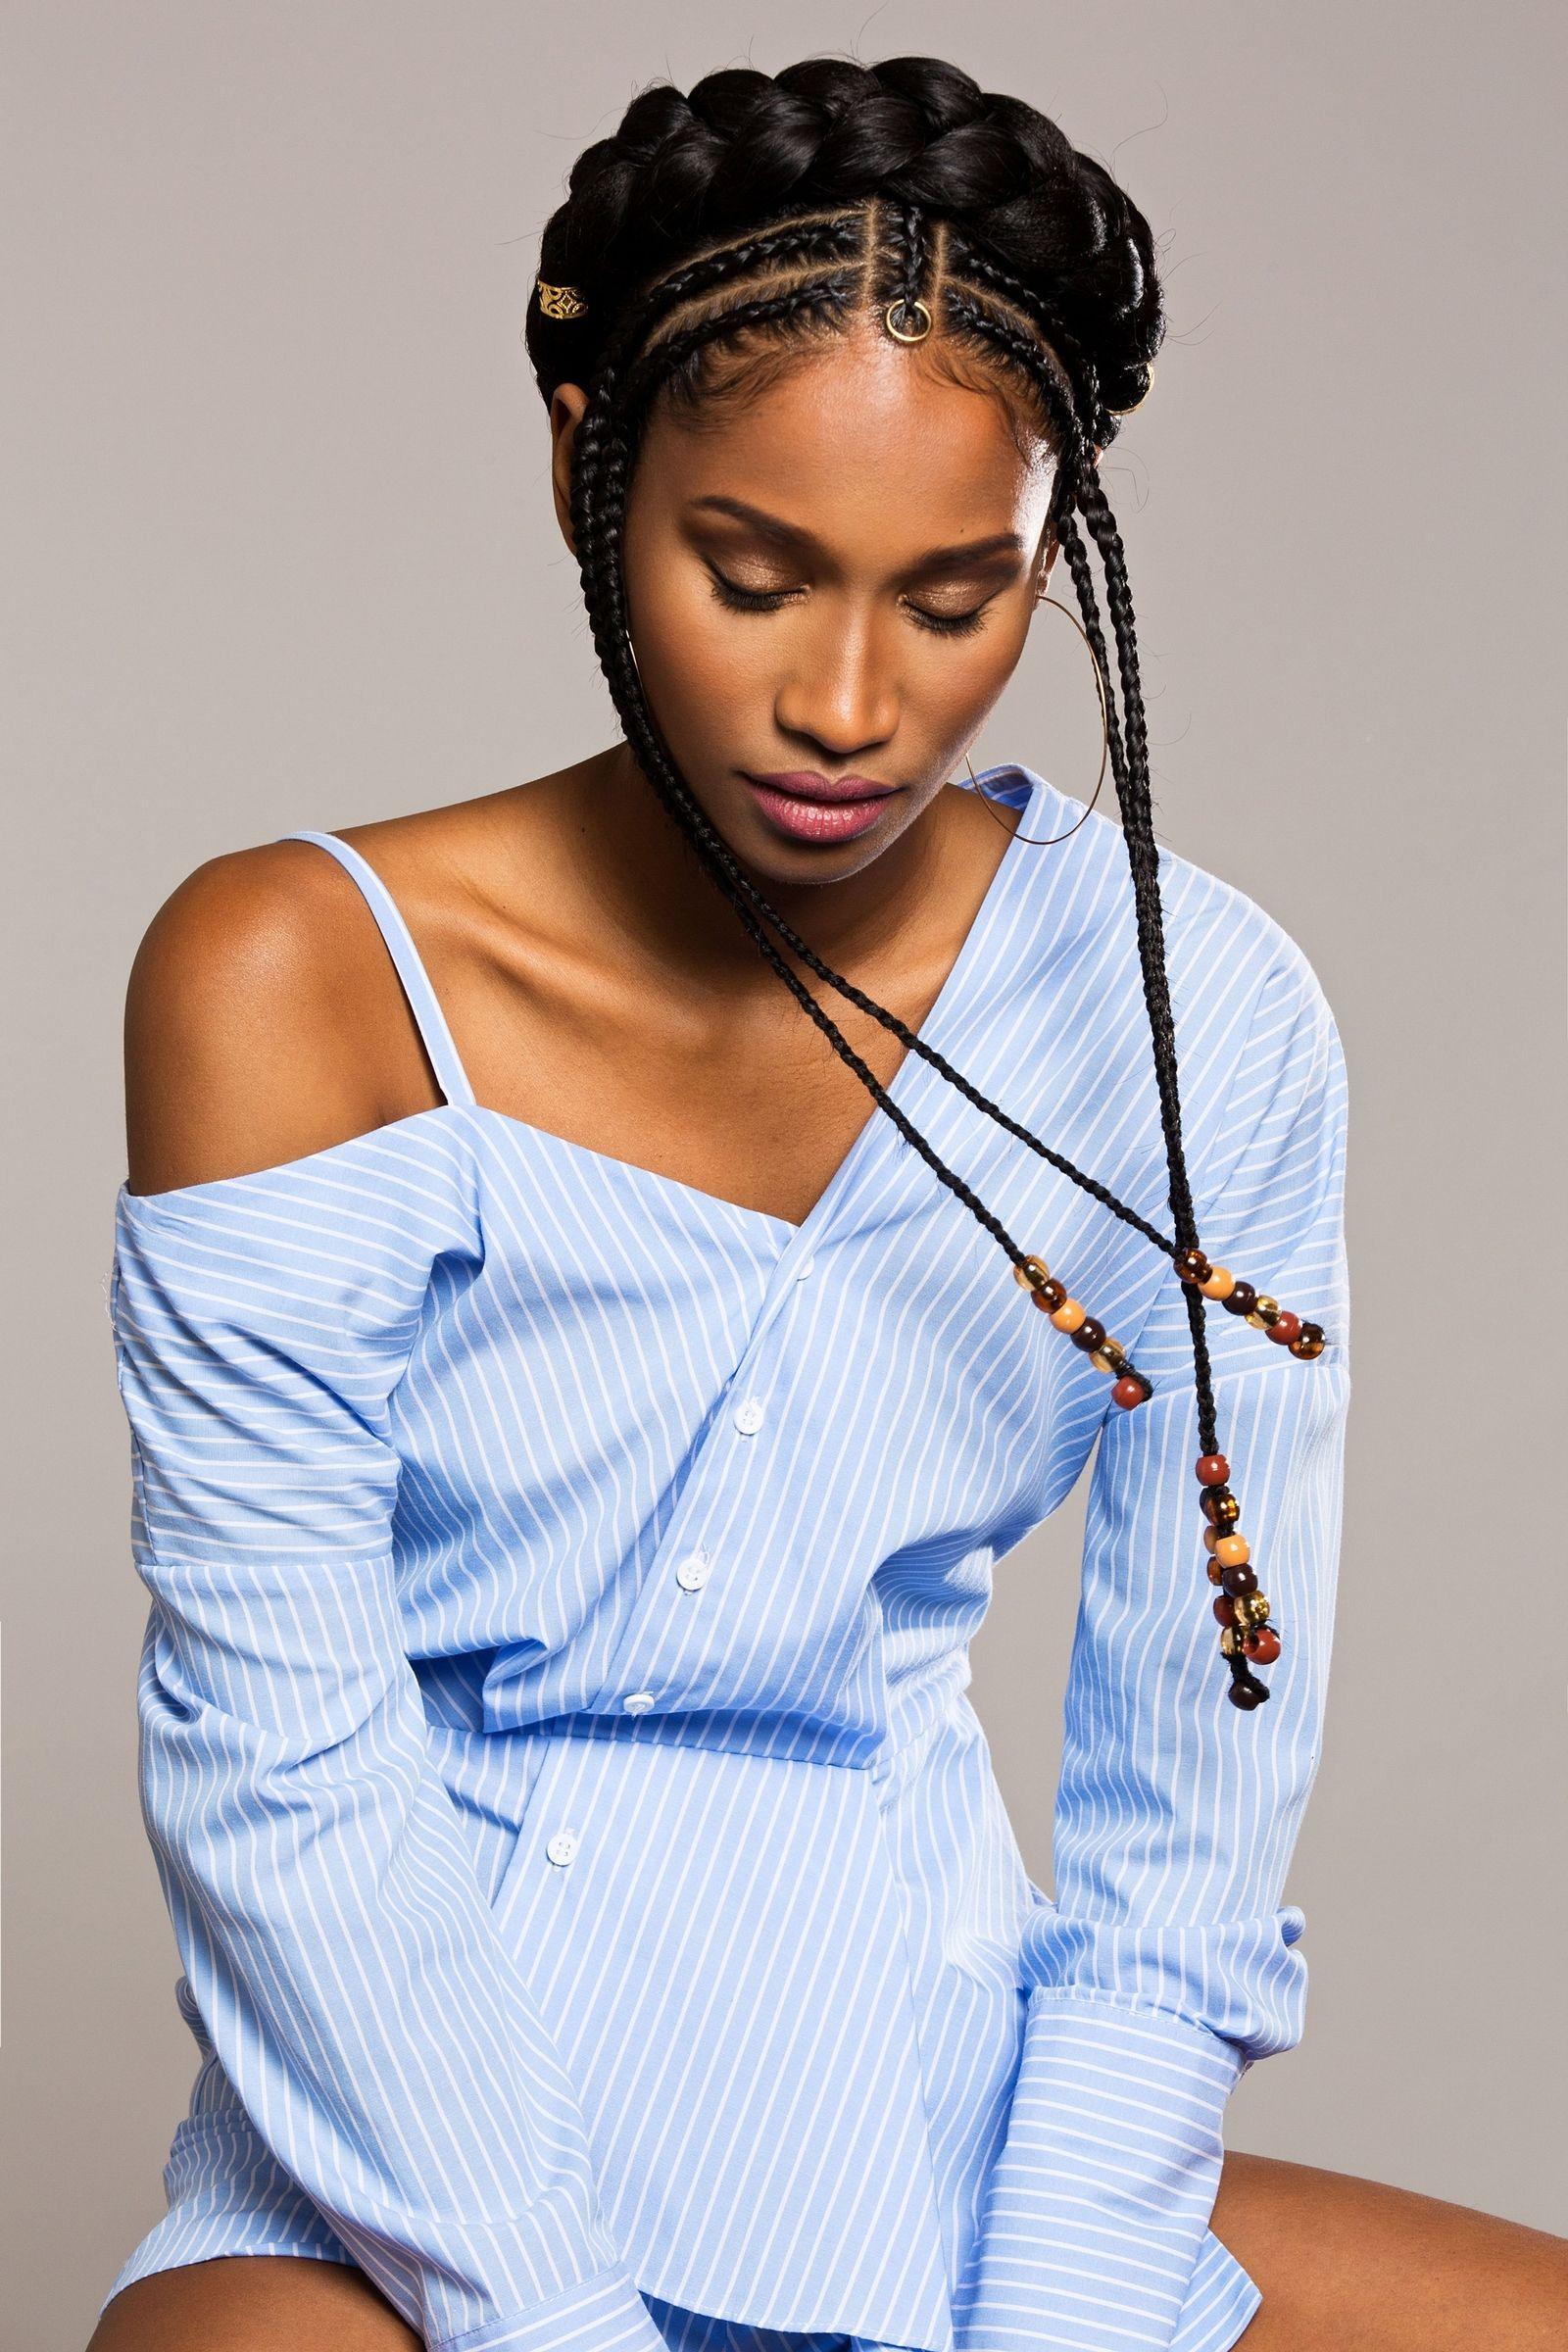 Ghana Braids Hair Style hairstyleforblackwomen.net 104